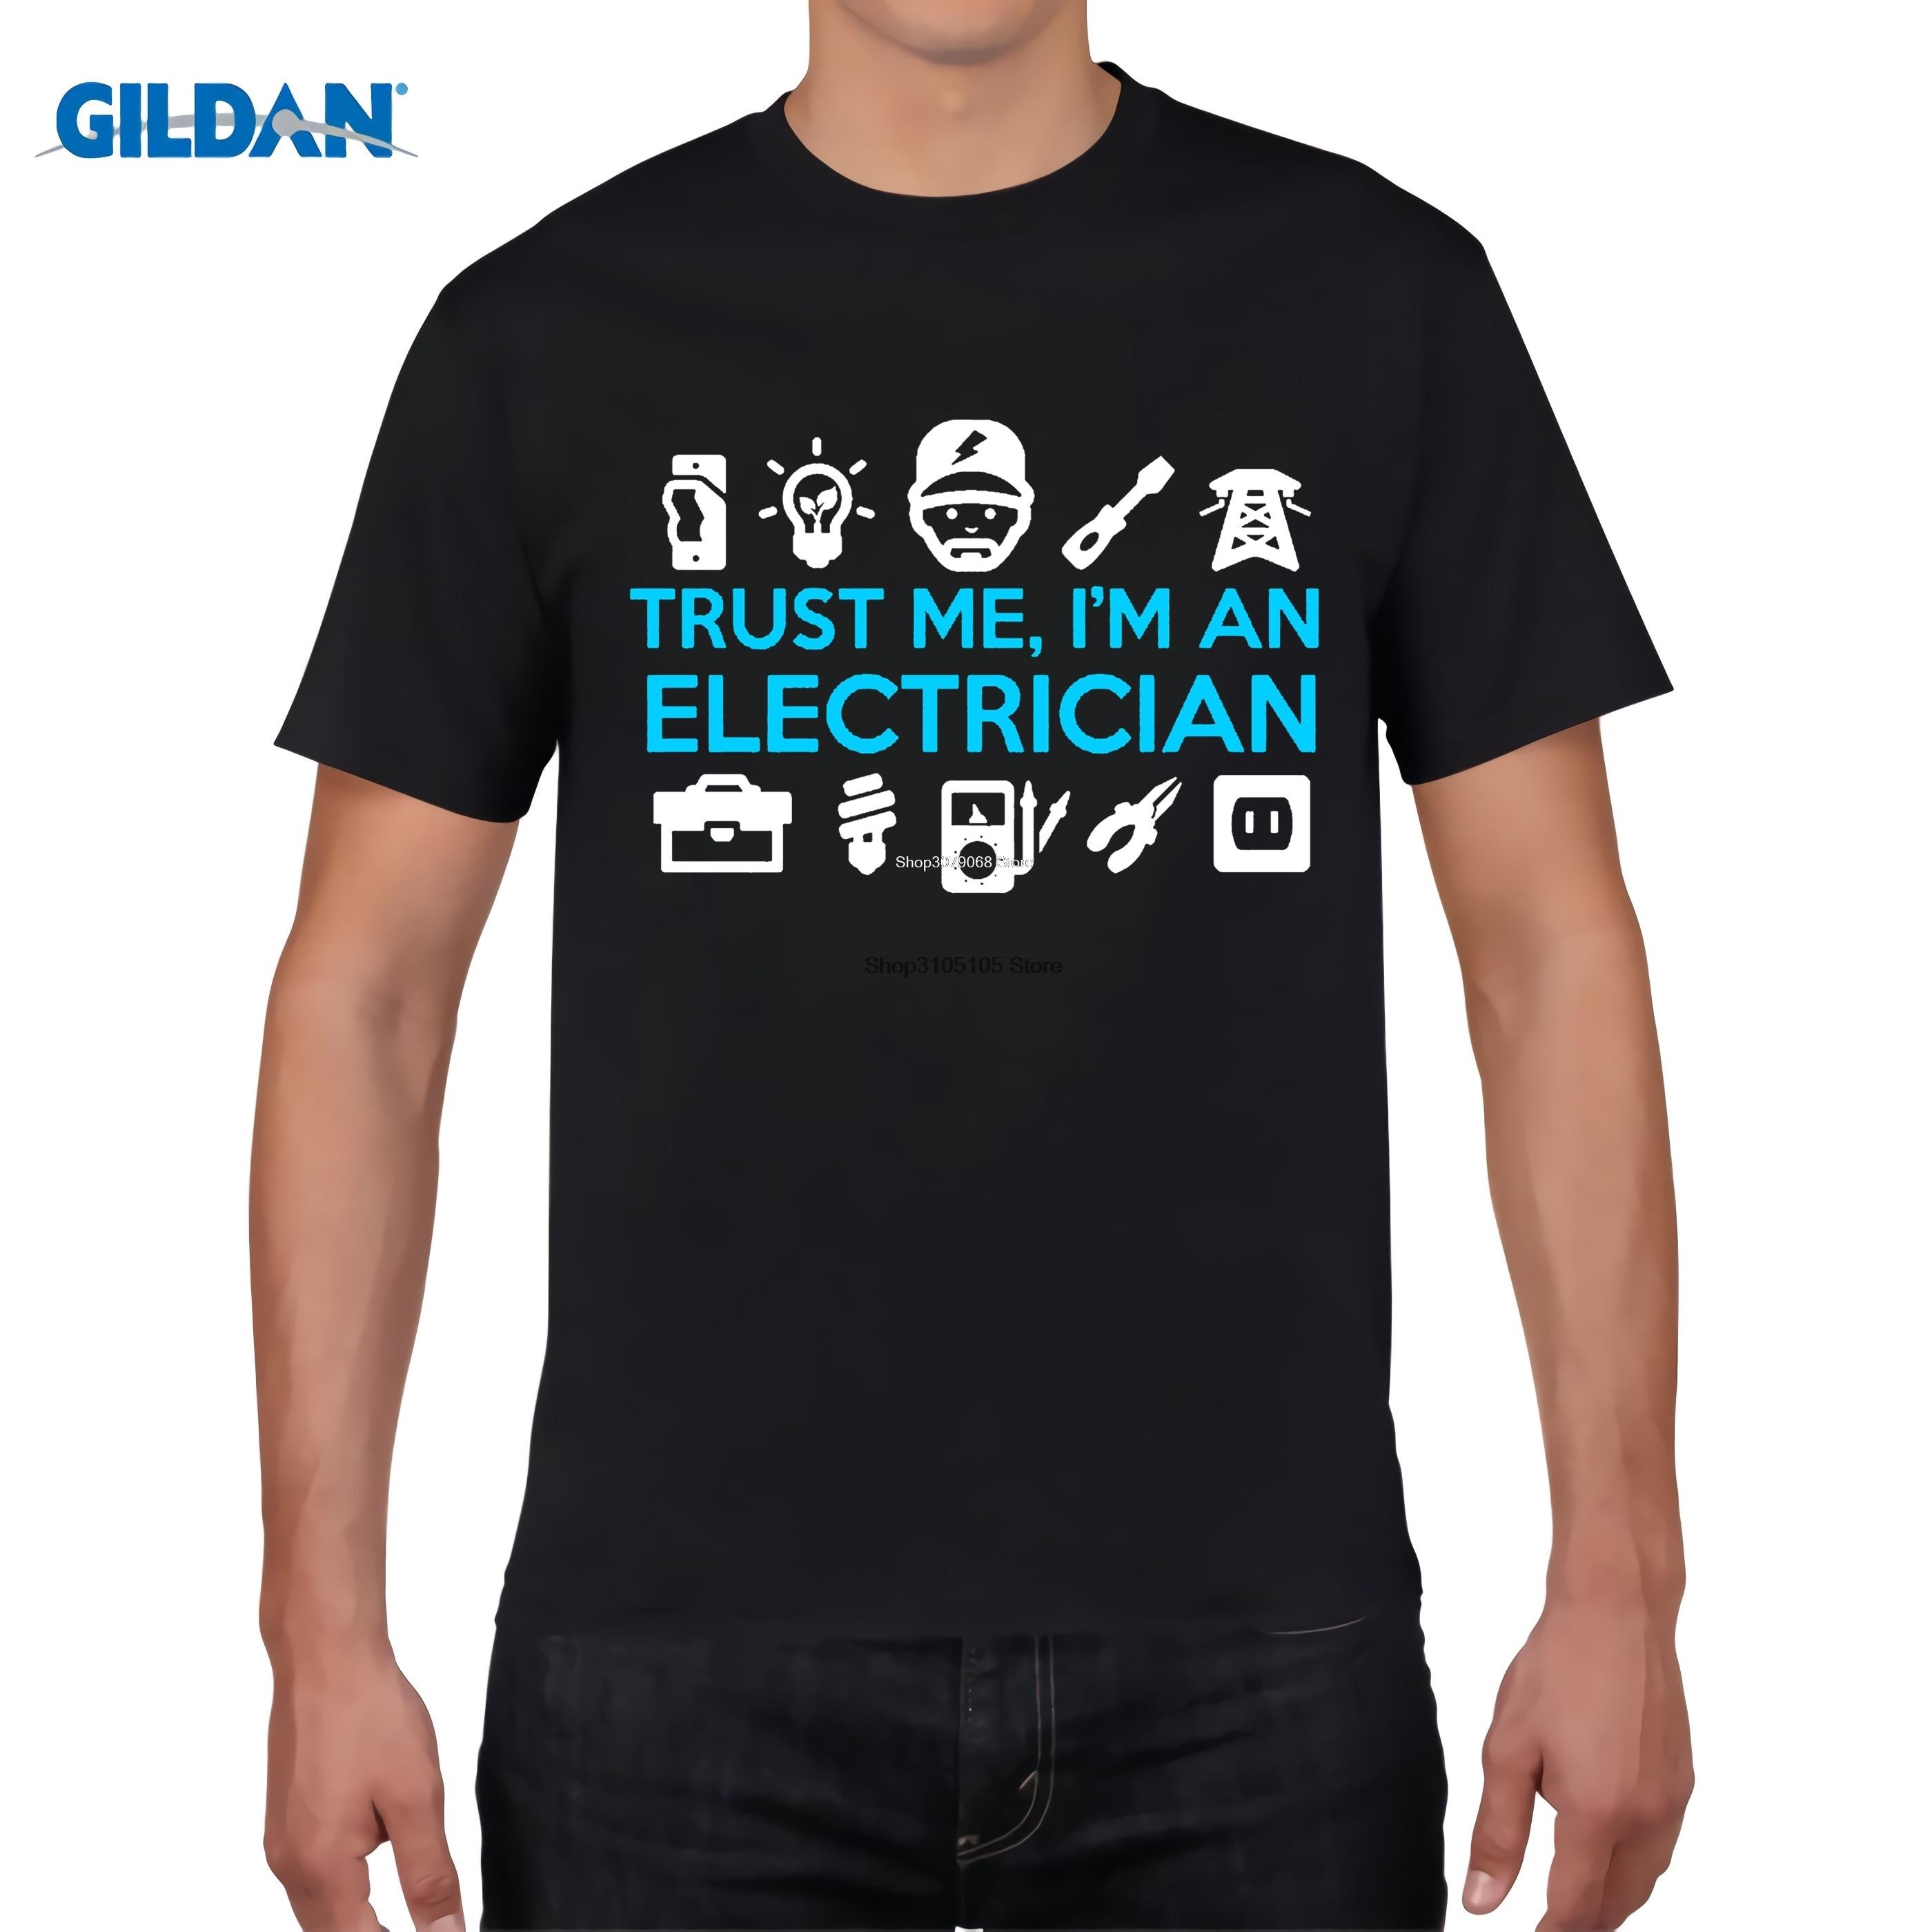 T-shirts Men's Clothing Gildan Designer T Shirt Fashion Hot Men T Shirt Summer Style Funny Trust Me Im An Electrician T Shirt Gift Idea Tops Tees Shirt